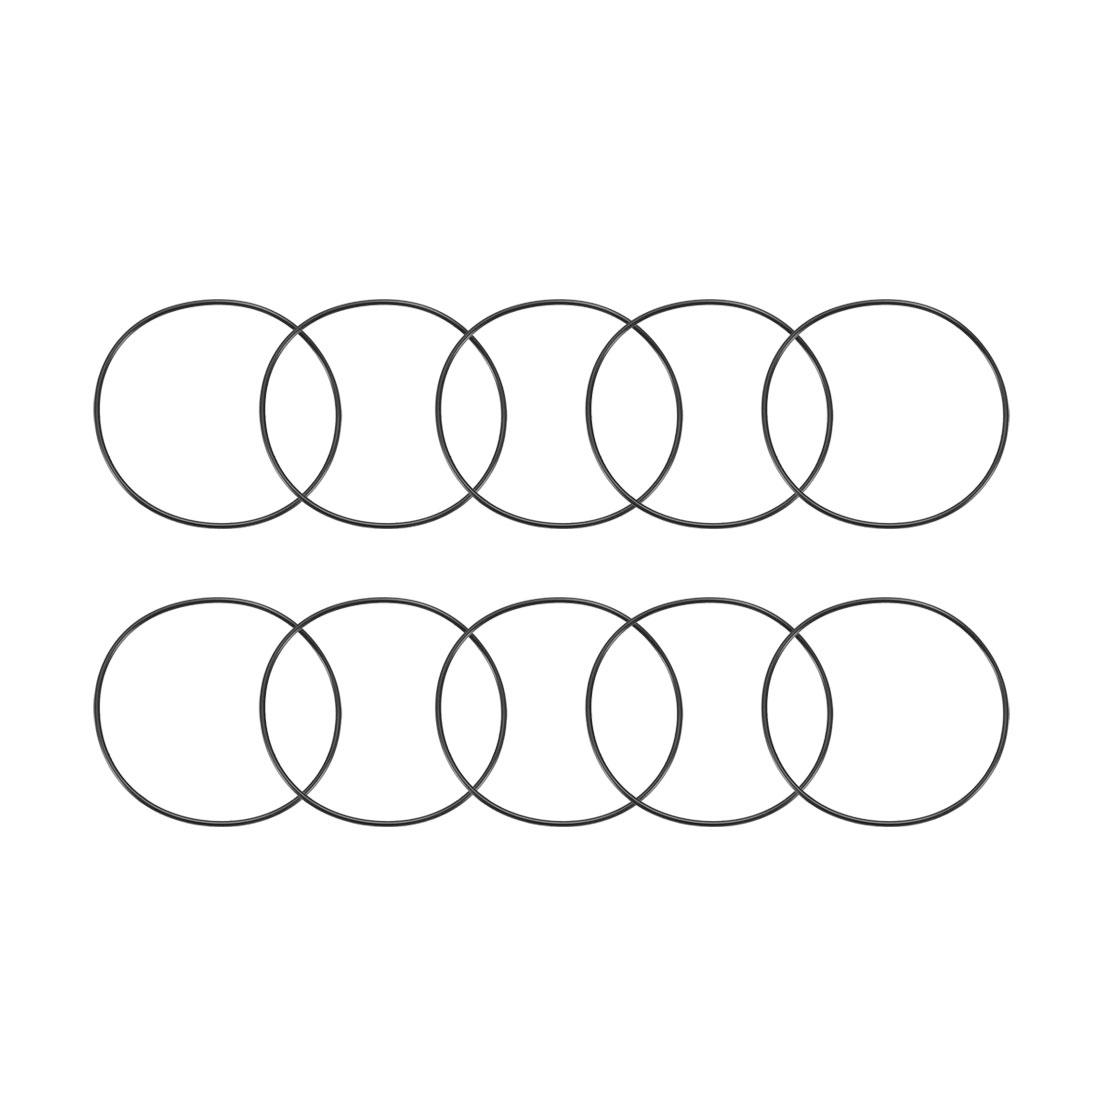 10 Pcs Metric O Rings Black Nitrile Rubber 95mm OD 2.5mm Thick